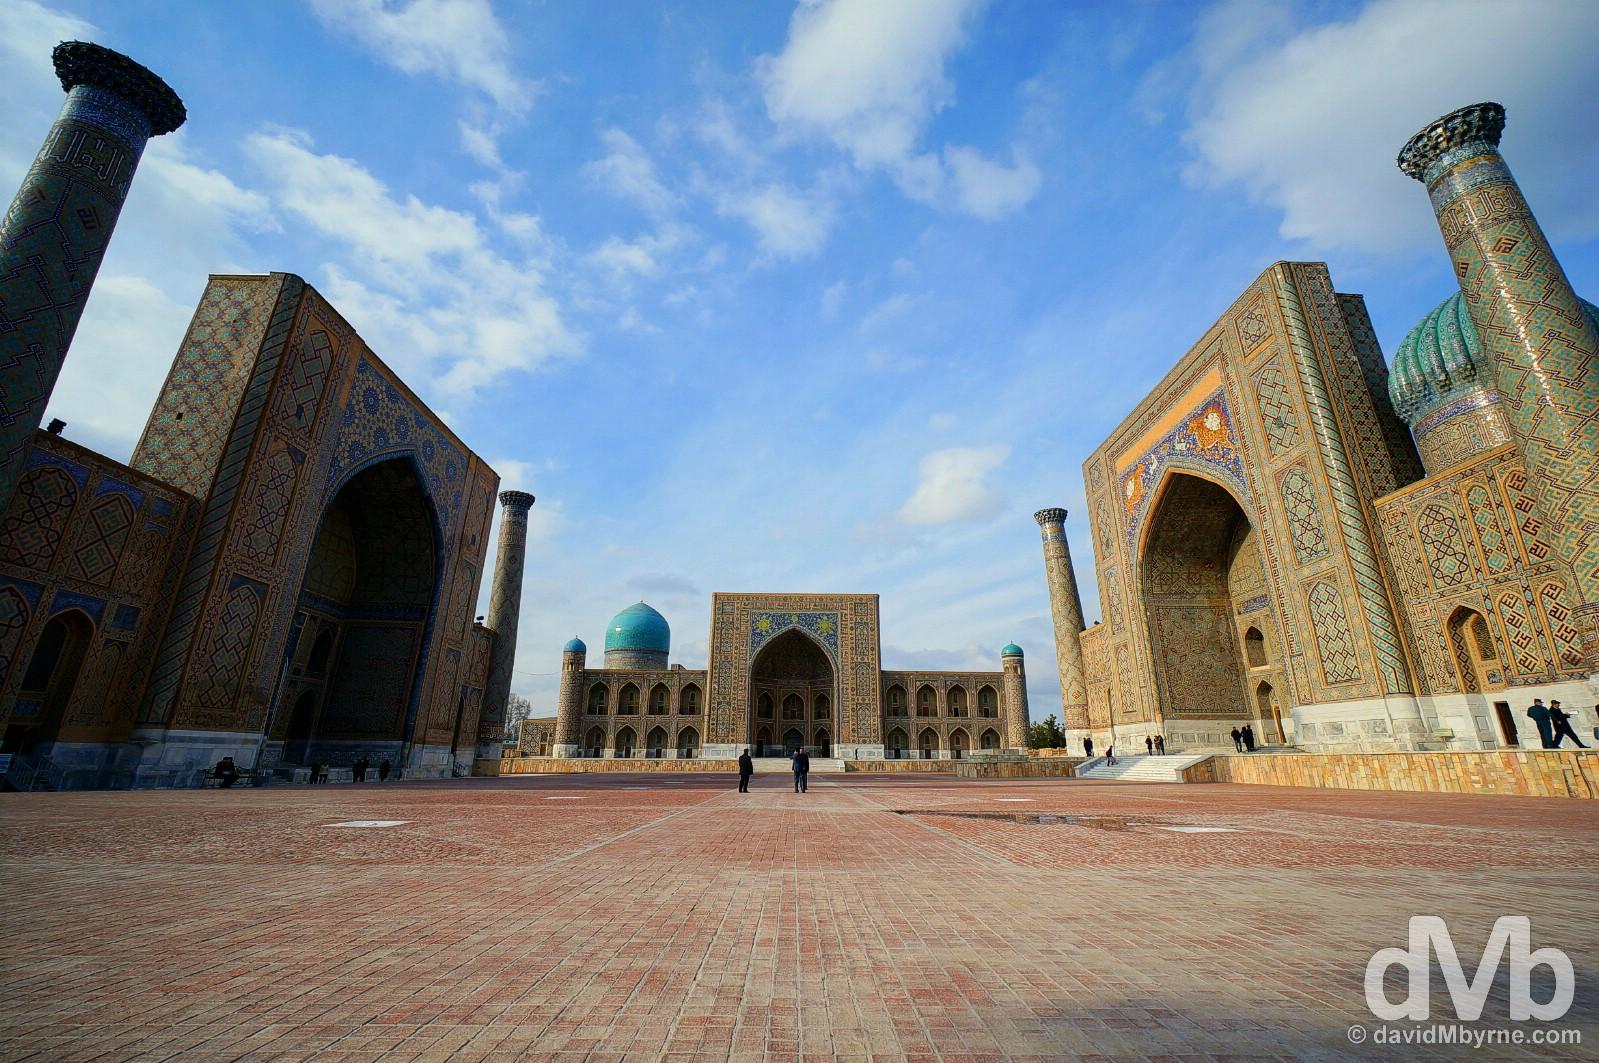 The Registan in Samarkand, Uzbekistan. March 8, 2015.